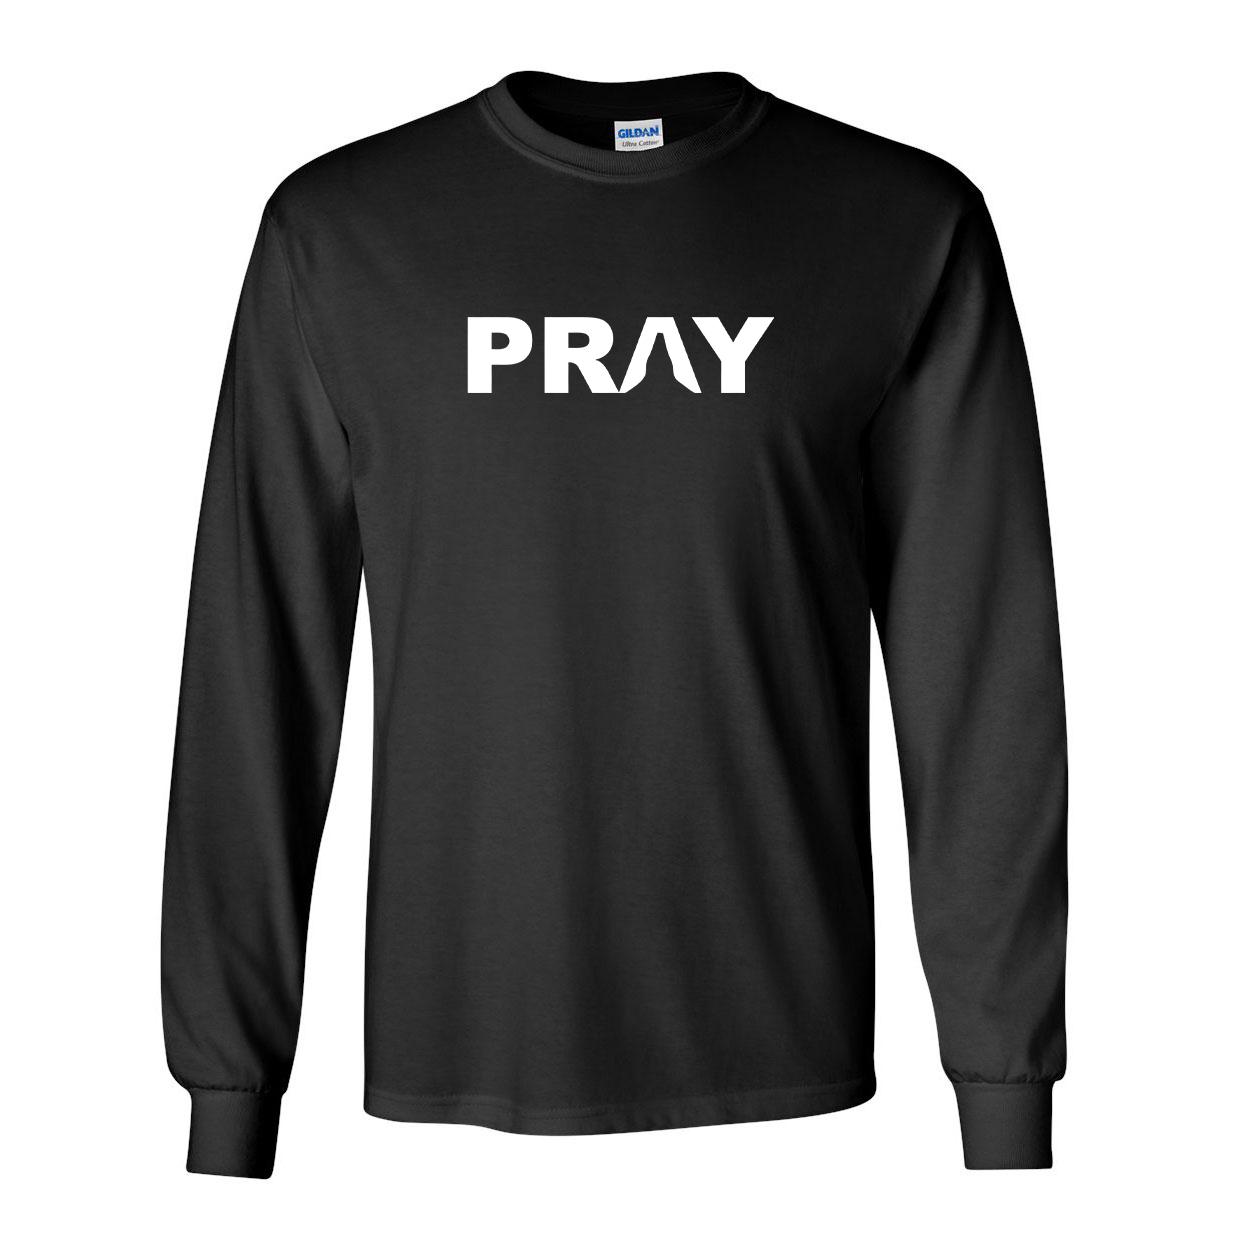 Pray Hands Logo Classic Long Sleeve T-Shirt Black (White Logo)